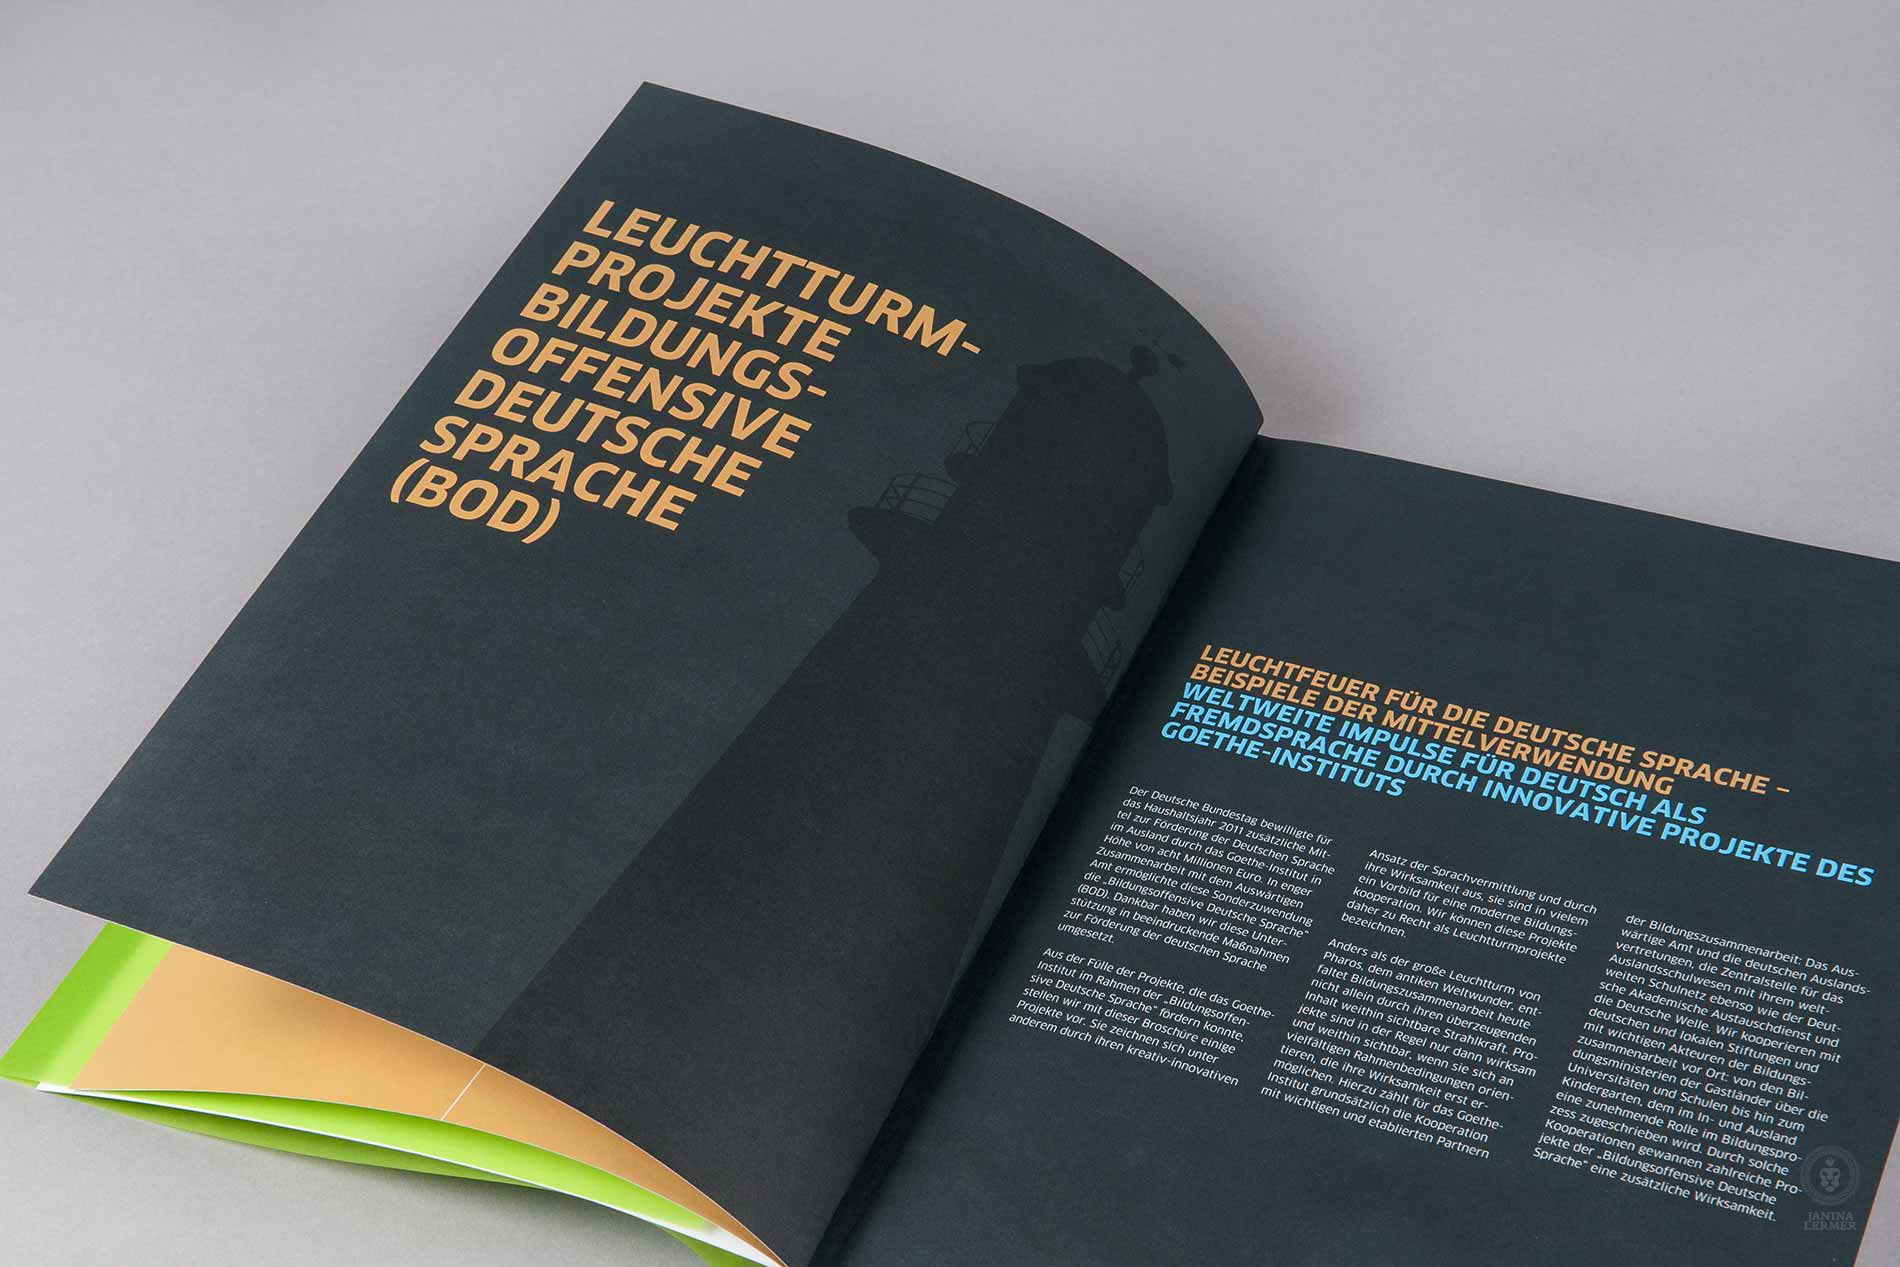 Janina-Lermer-Buchgestaltung-Magazingestaltung-Editorialdesign-Lighthouse-optic-German-language-BOD-Goethe_Institut